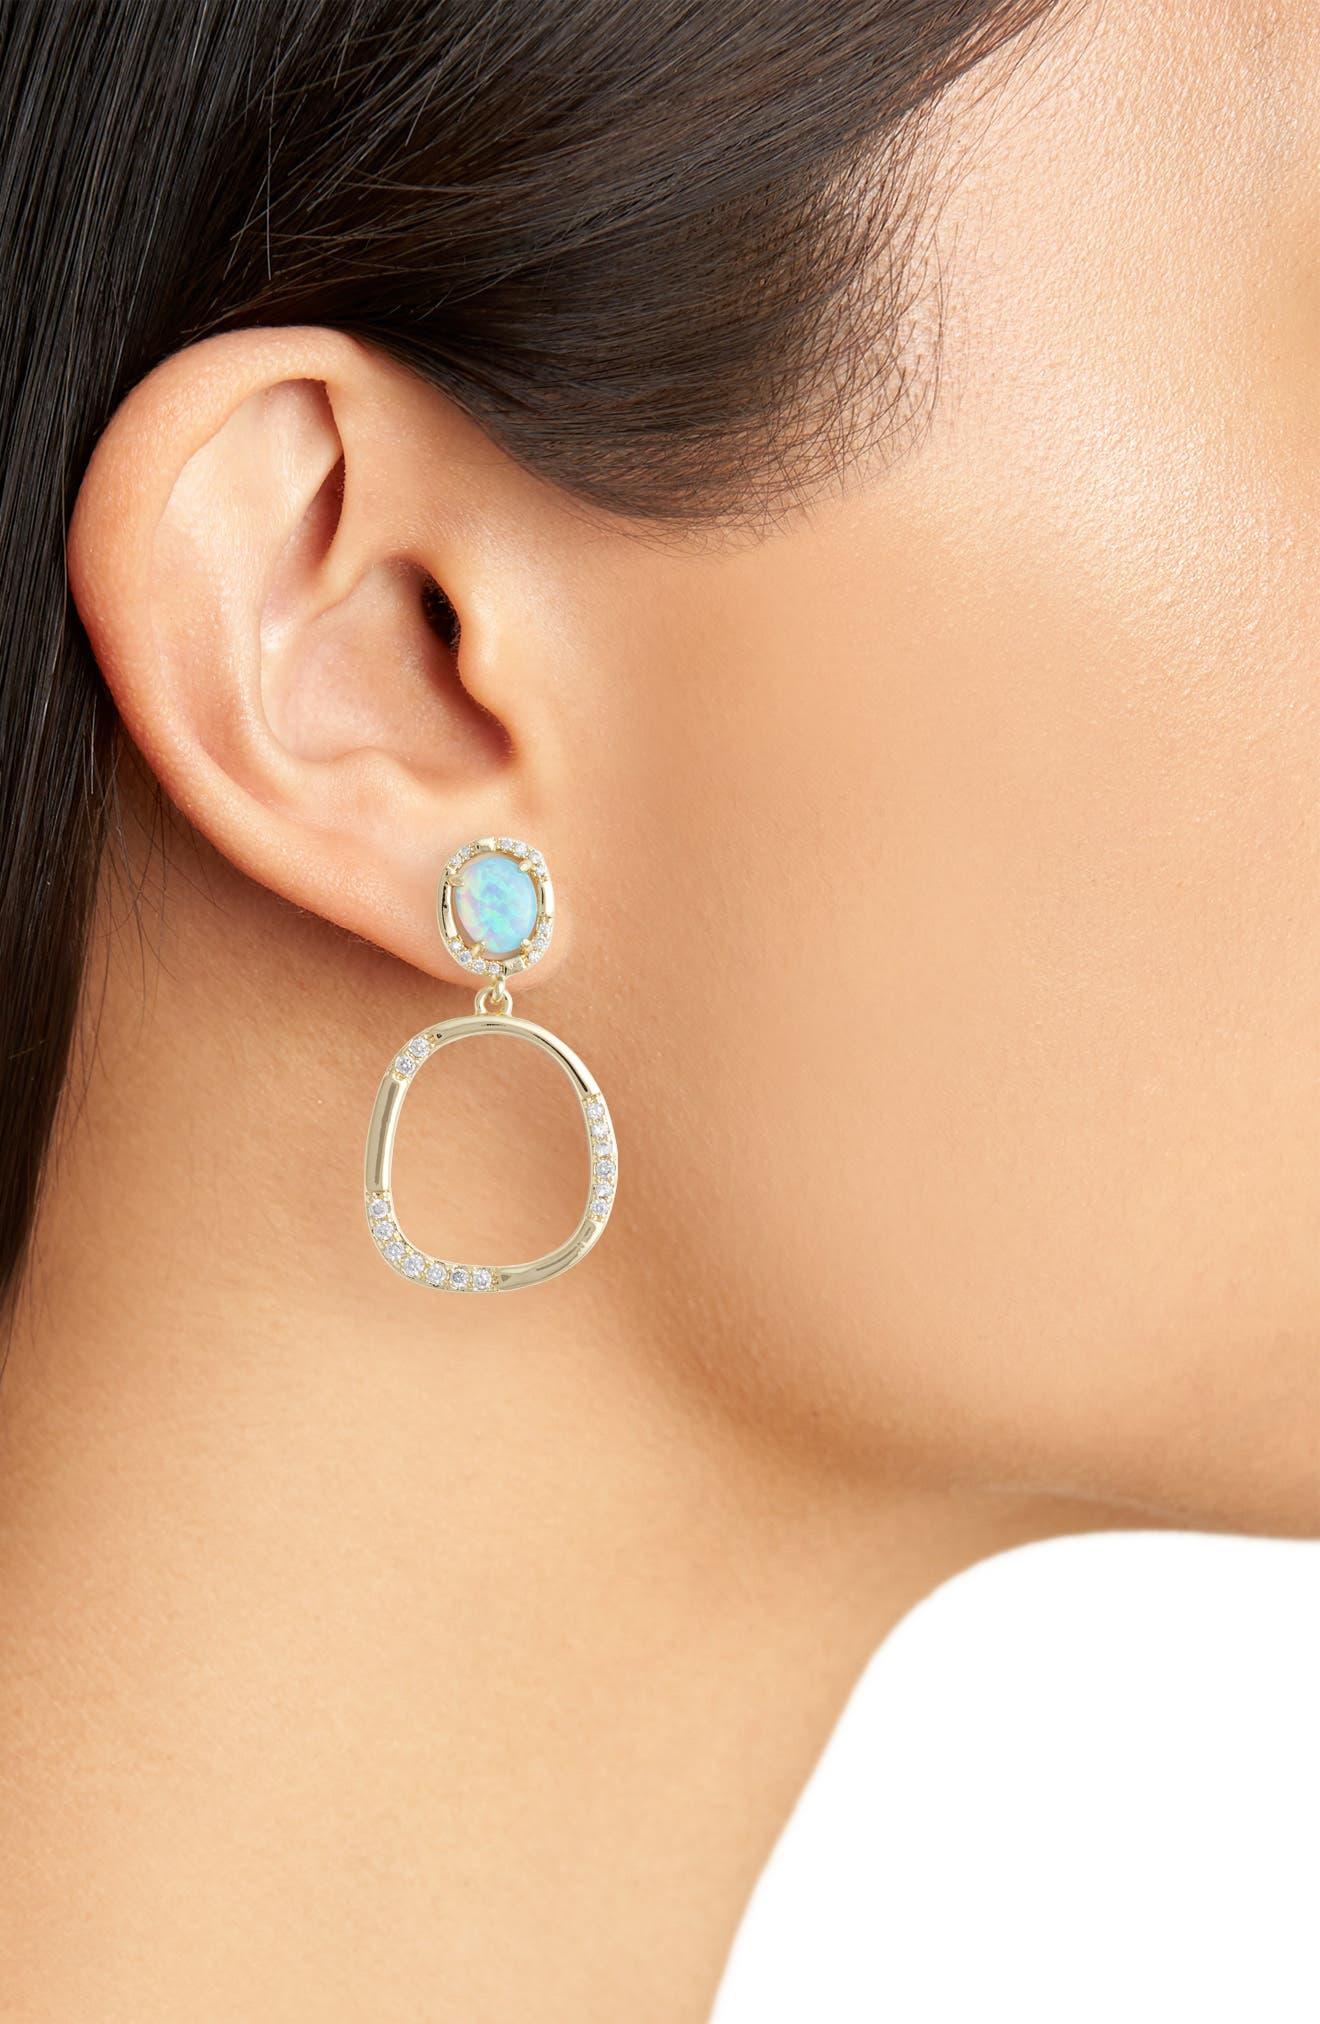 Luna Opal Drop Earrings,                             Alternate thumbnail 2, color,                             Opal/ Crystal